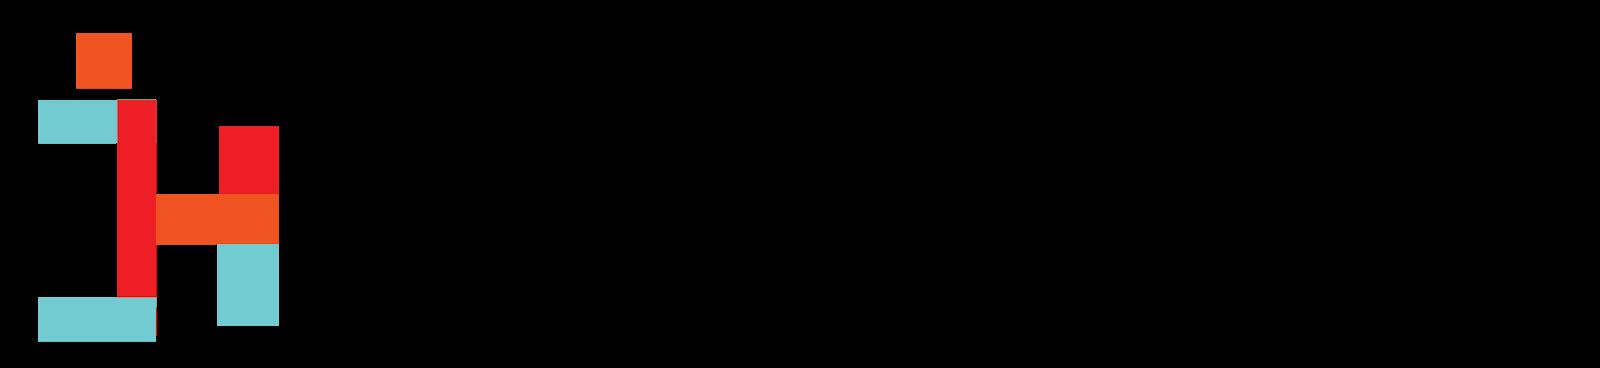 JnKDrama